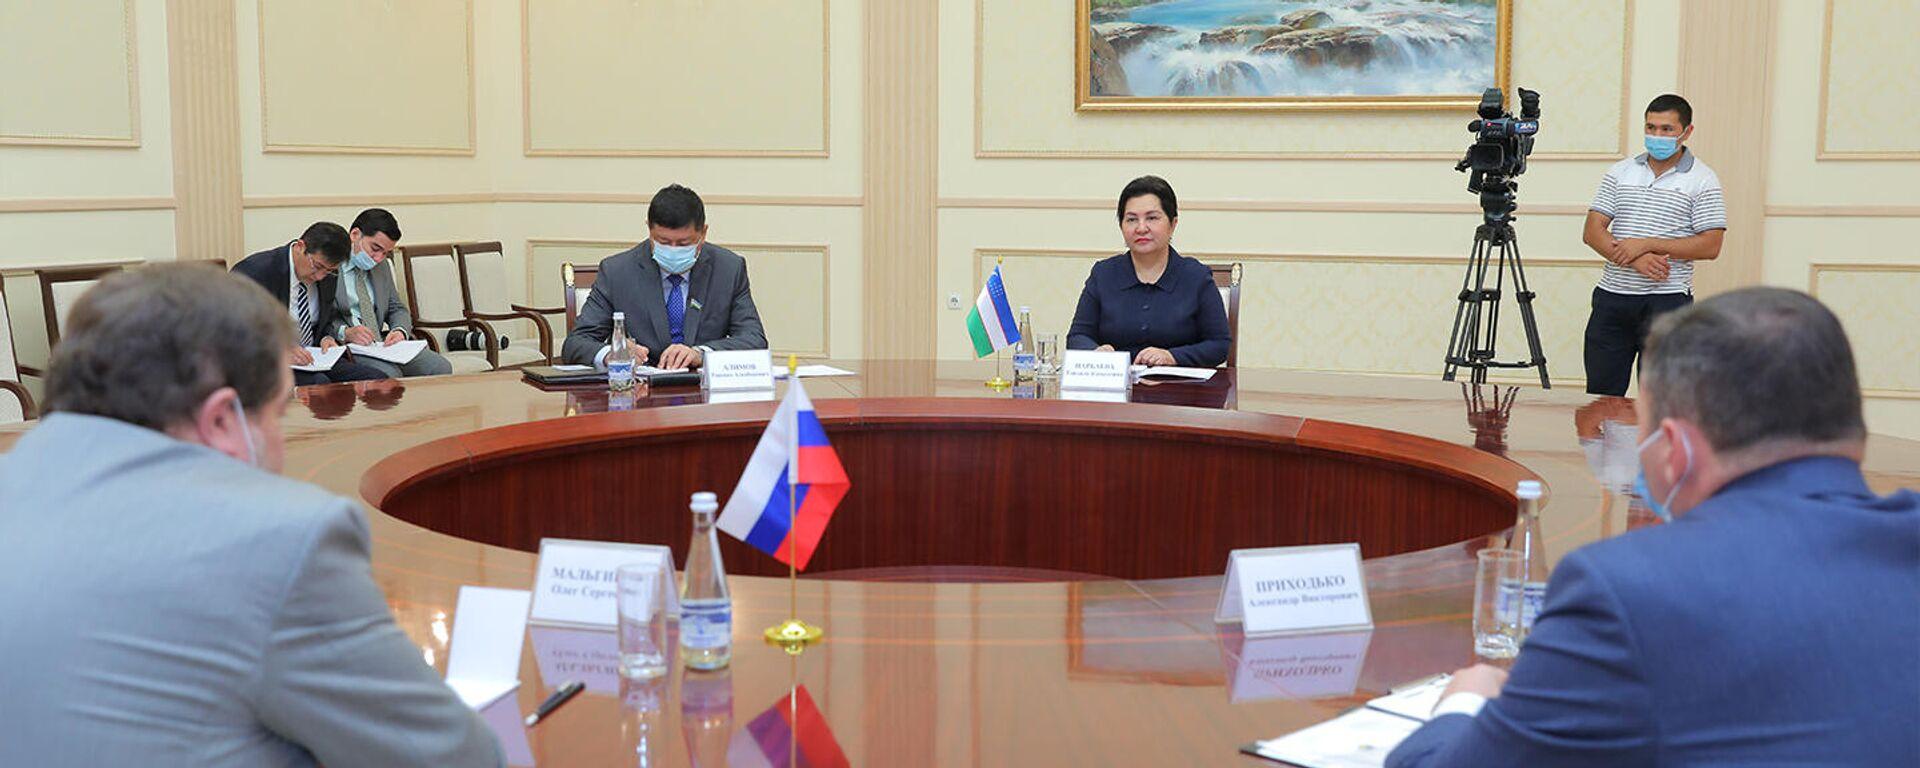 Глава Сената Узбекистана Танзила Нарбаева провела встречу с послом РФ в Узбекистане Олегом Мальгиновым - Sputnik Узбекистан, 1920, 10.07.2021